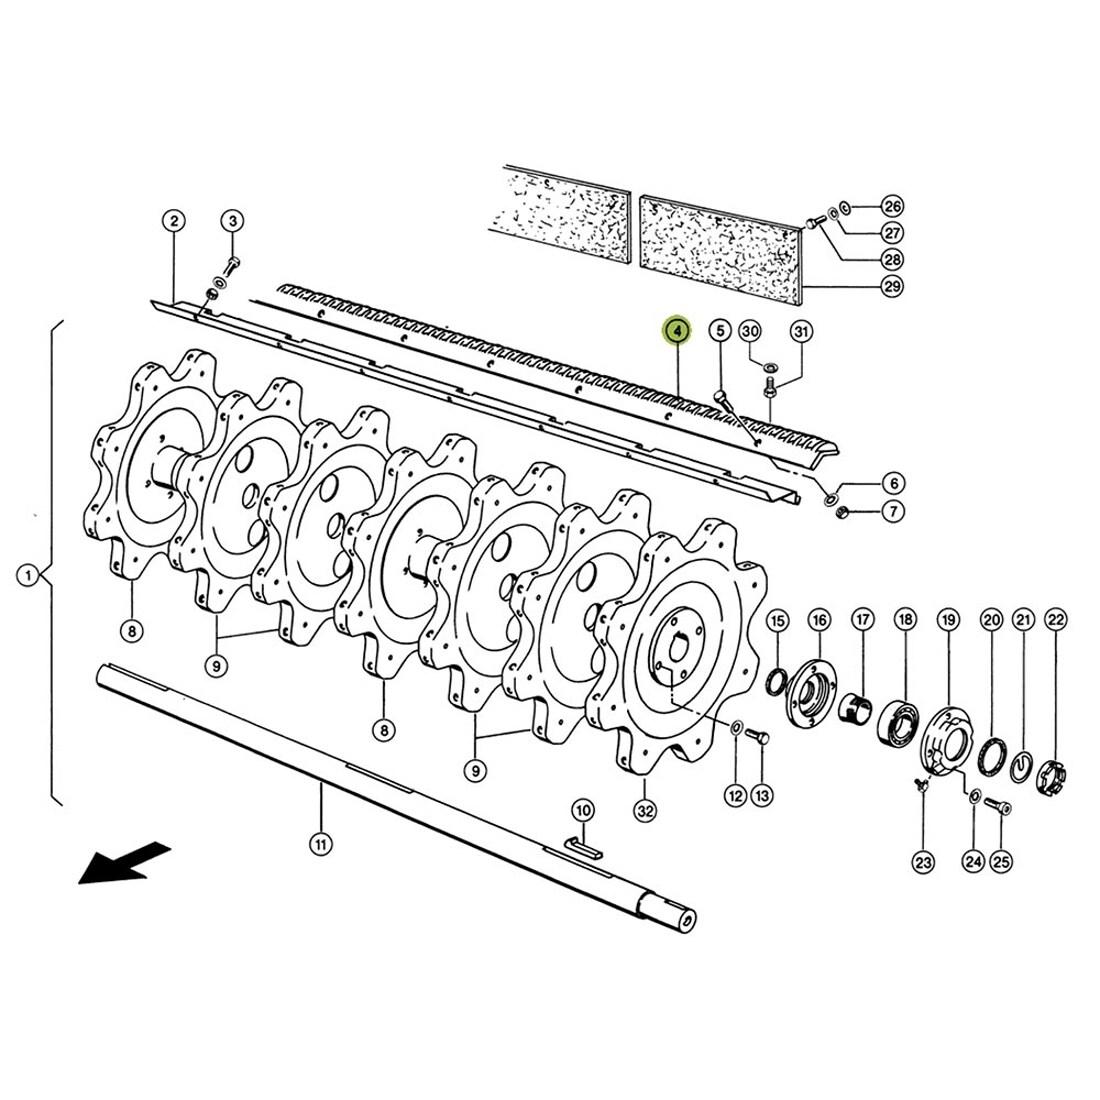 Rasp Bar / Beater Bar Set (2 pcs RH+RH) for Claas combine